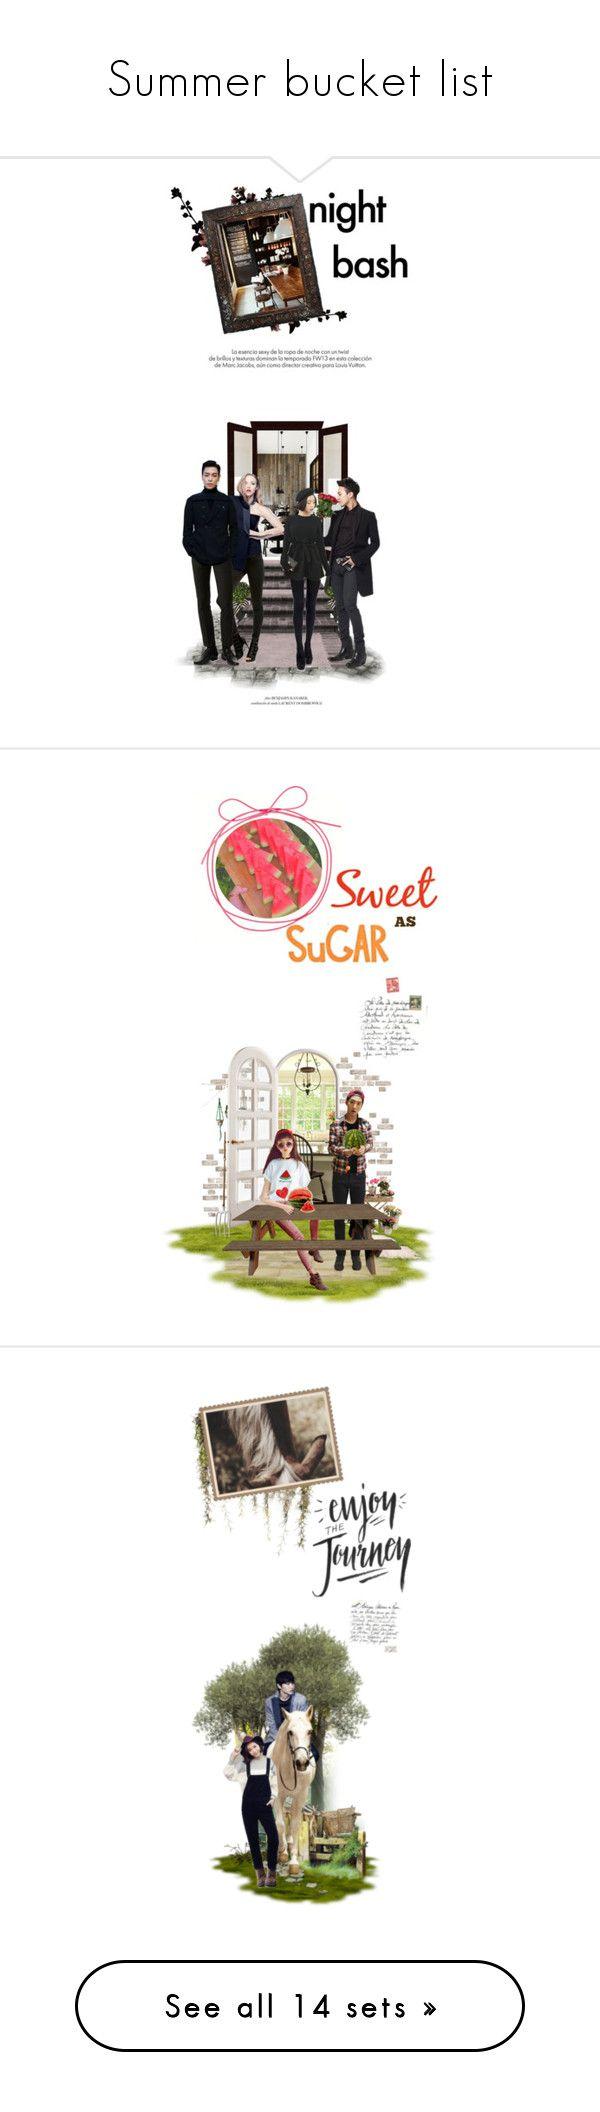 """Summer bucket list"" by followmiiin ❤ liked on Polyvore featuring kpop, art, doll, korean, Ulzzang, JayPark, kpopdoll, beauty, Farhi by Nicole Farhi and CO"